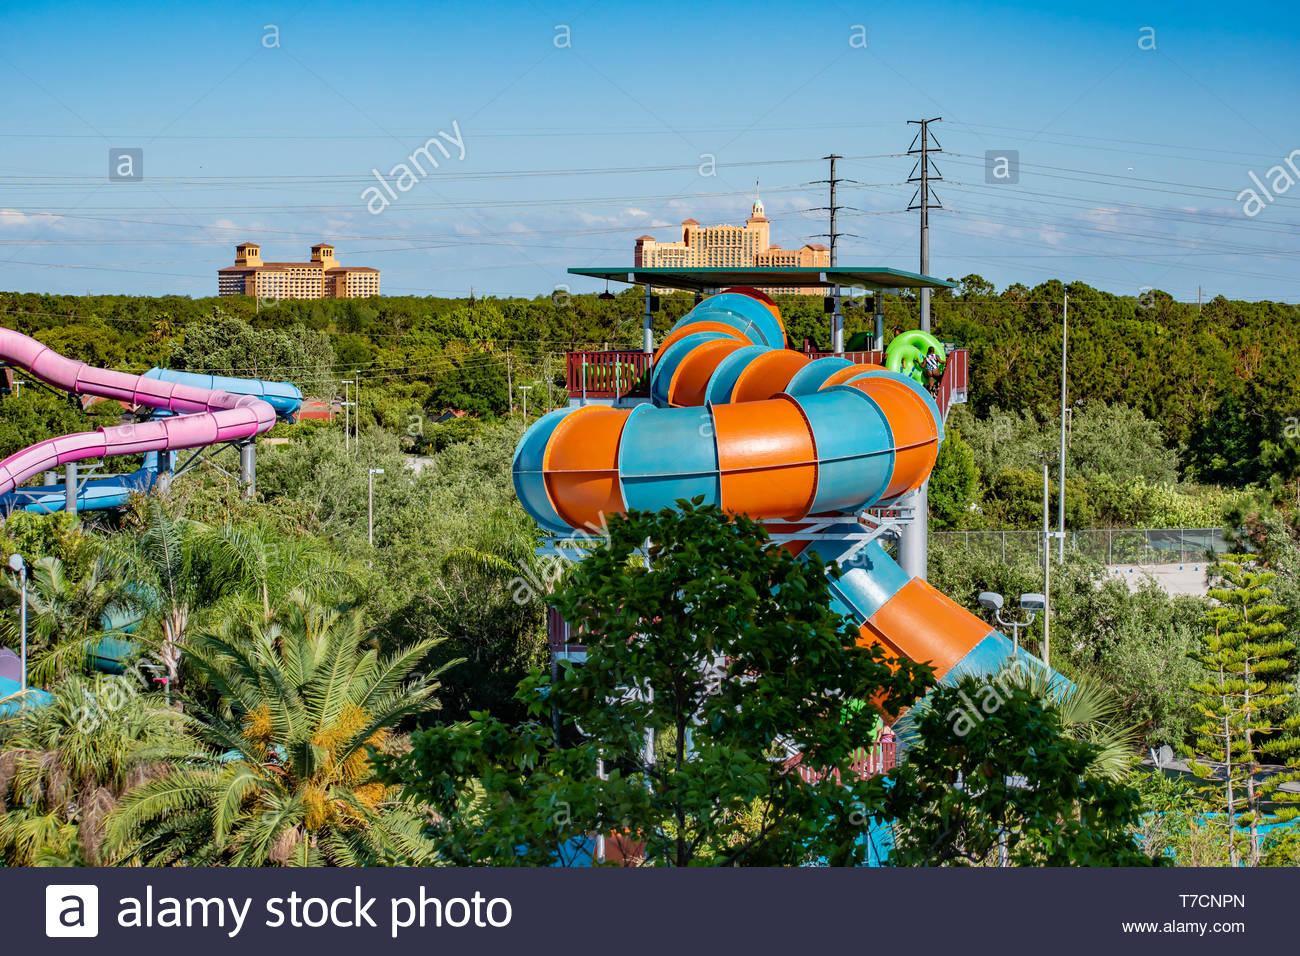 Orlando Florida April 20 2019 Top view of Aquatica water park 1300x956